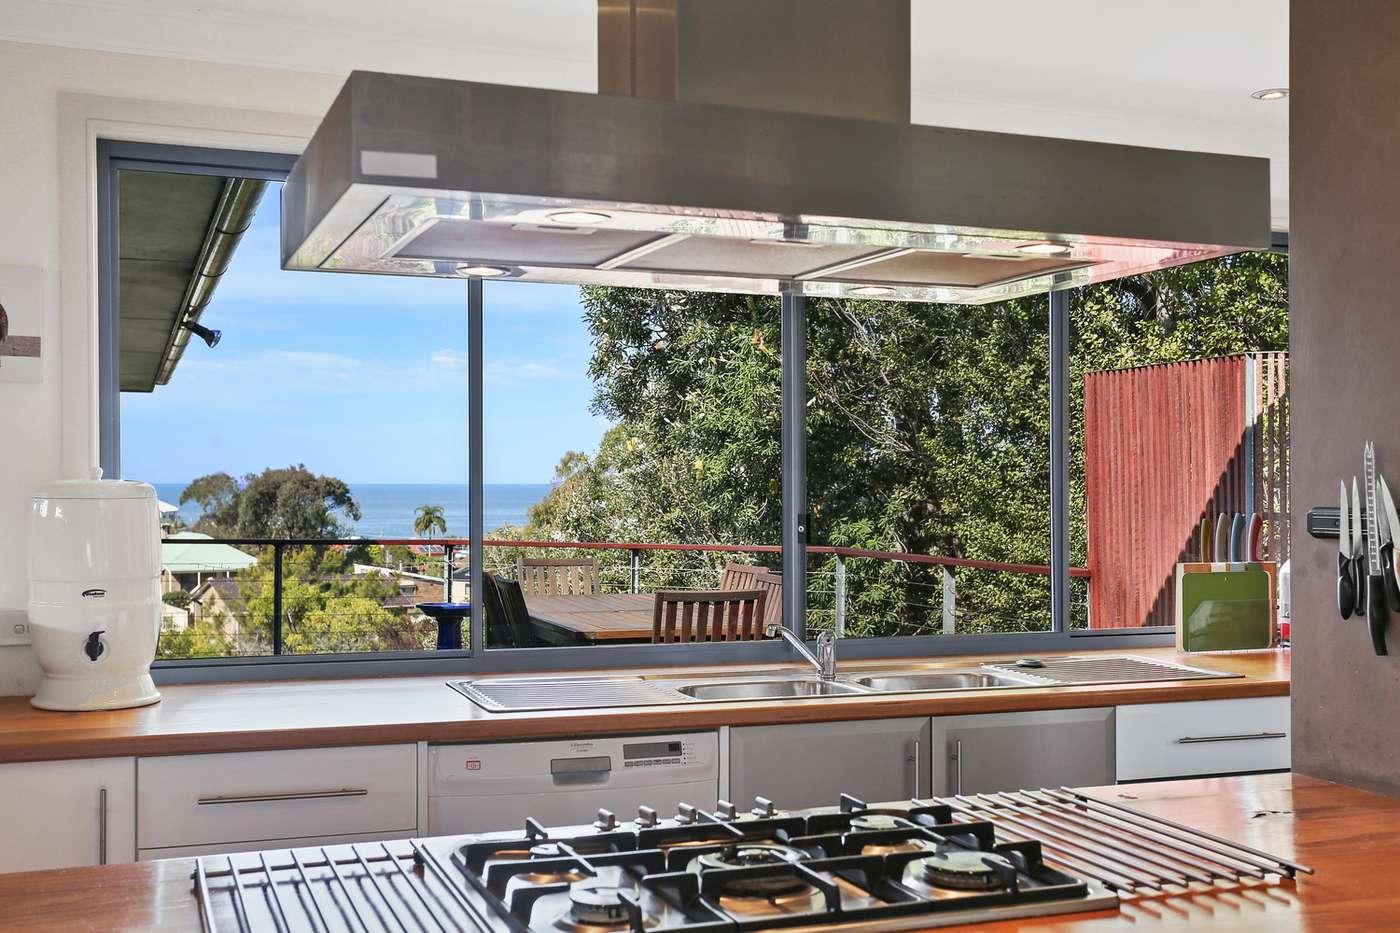 Main view of Homely house listing, 20 Baldwin Avenue, Kianga, NSW 2546